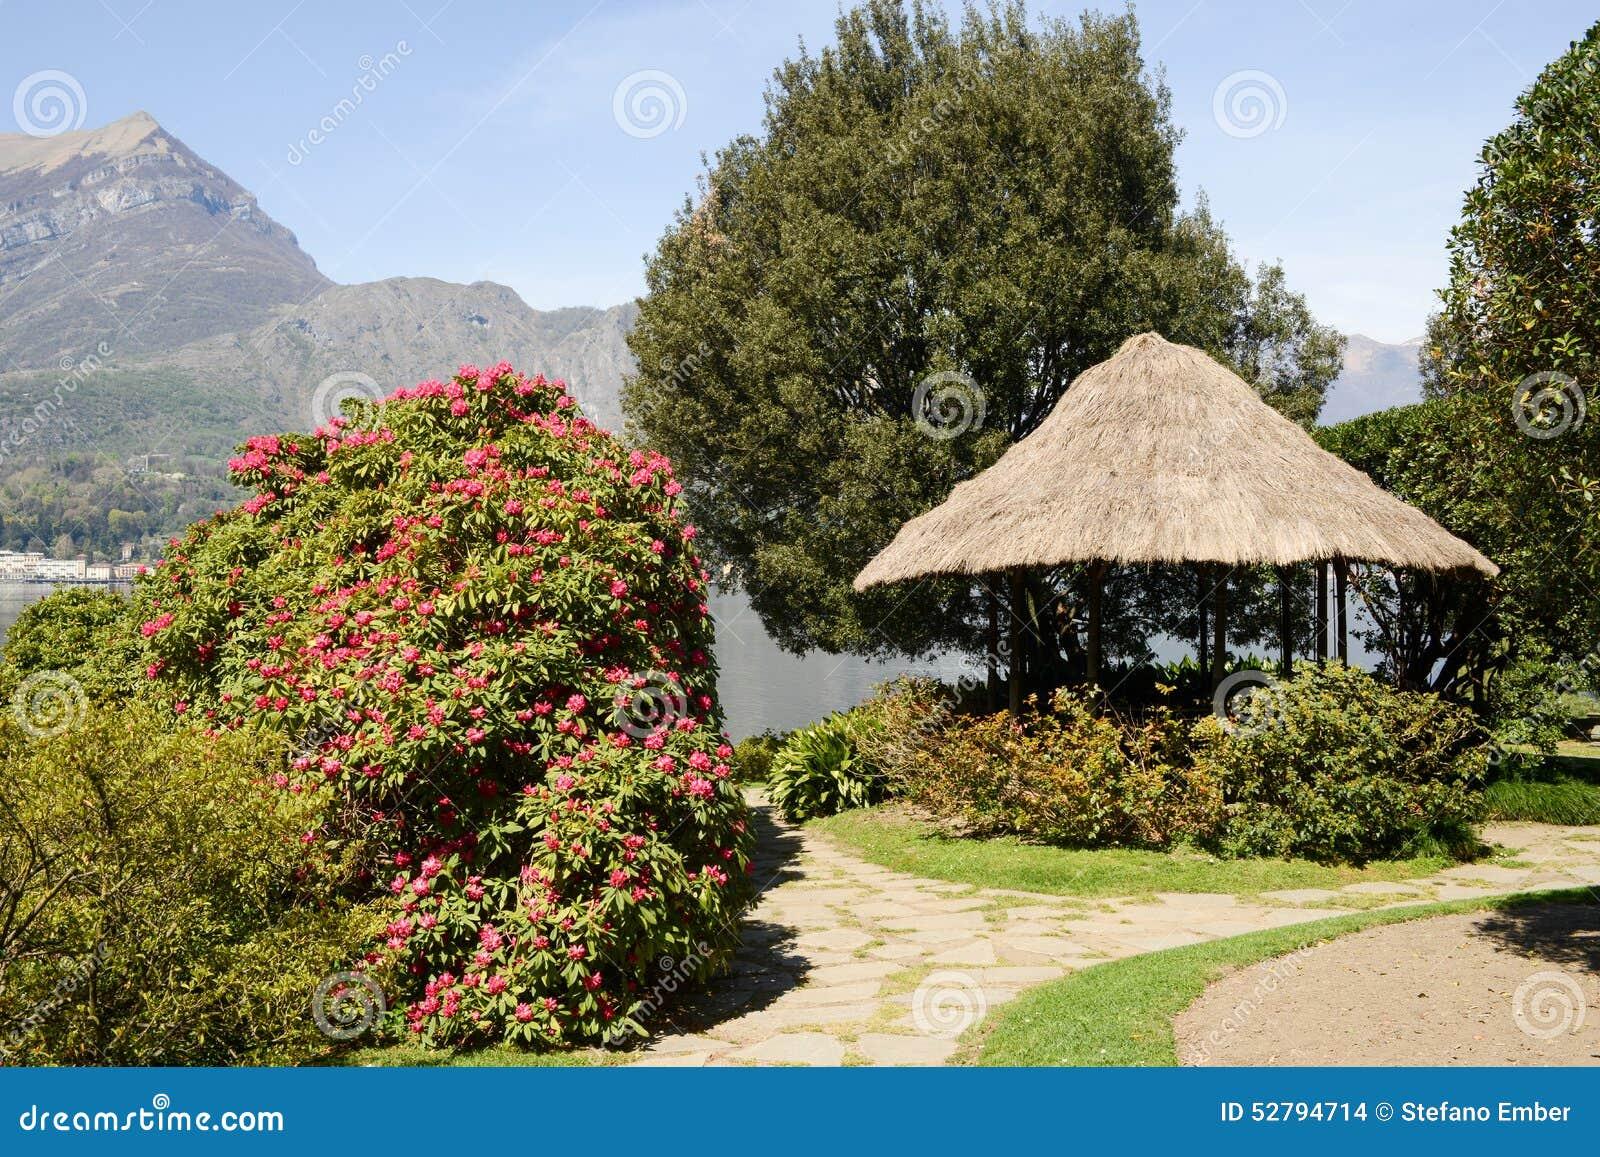 Gardens Of Villa Melzi On Lake Como Stock Photo - Image of shrubs ...